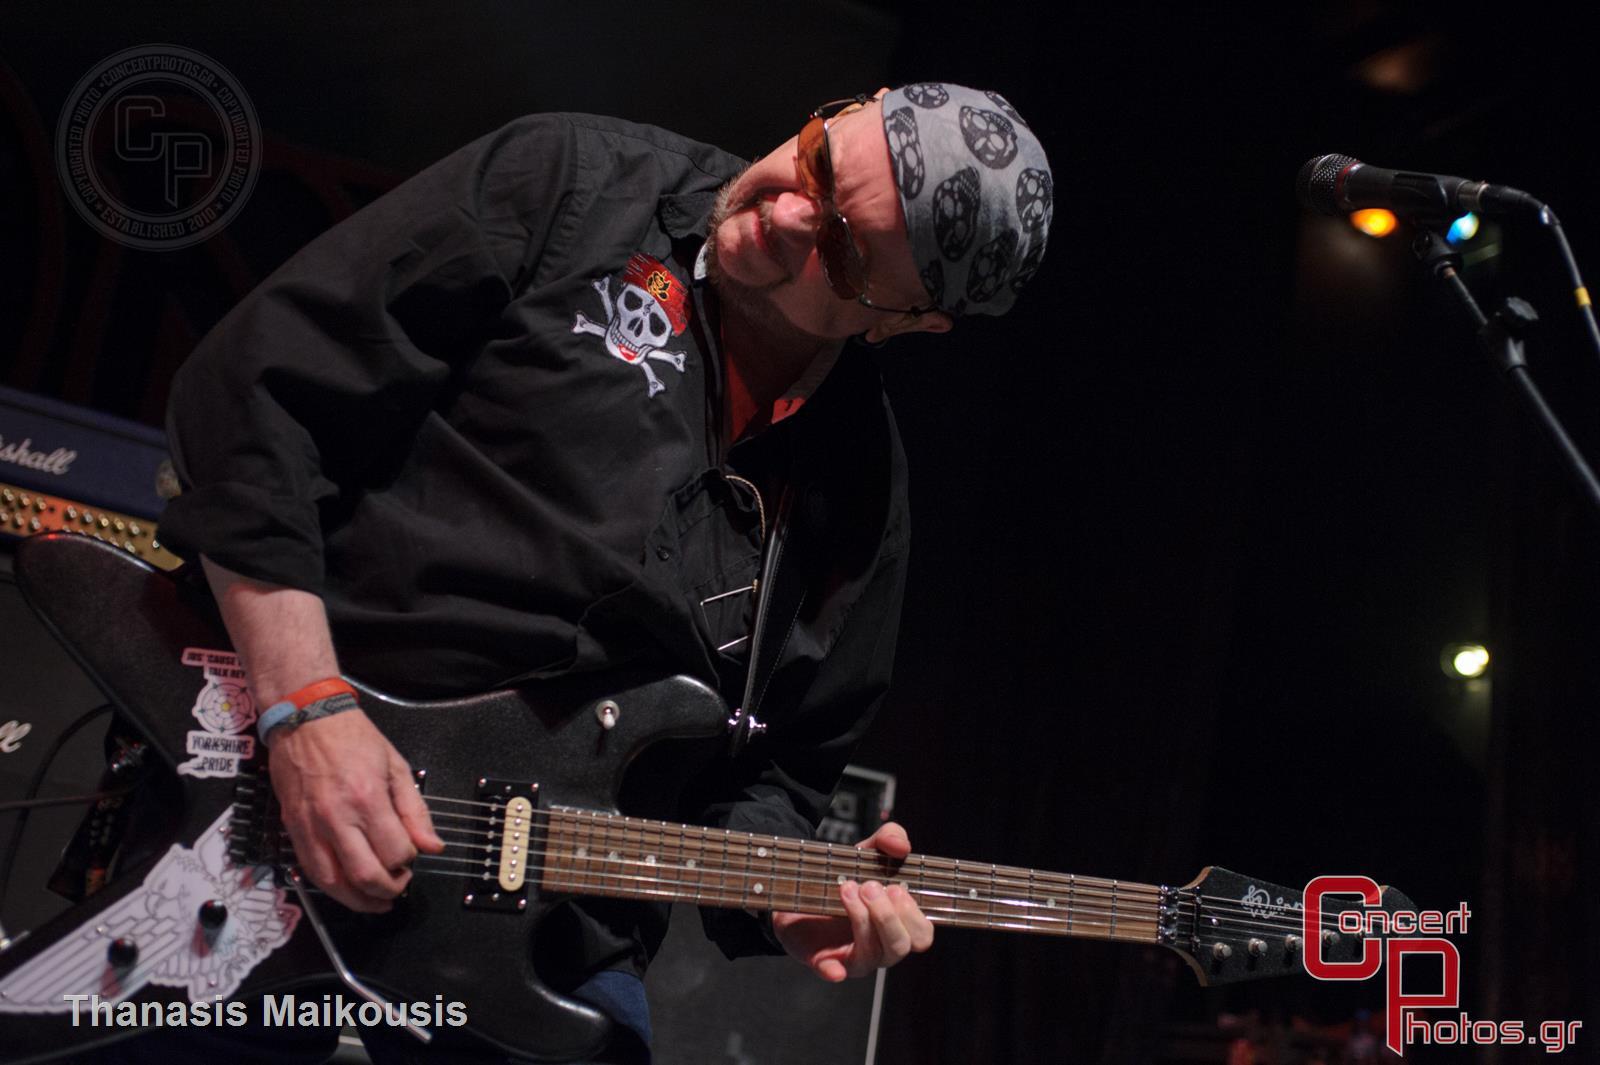 Saxon & Innerwish -Saxon Innerwish Gagarin photographer: Thanasis Maikousis - concertphotos_20141025_22_26_39